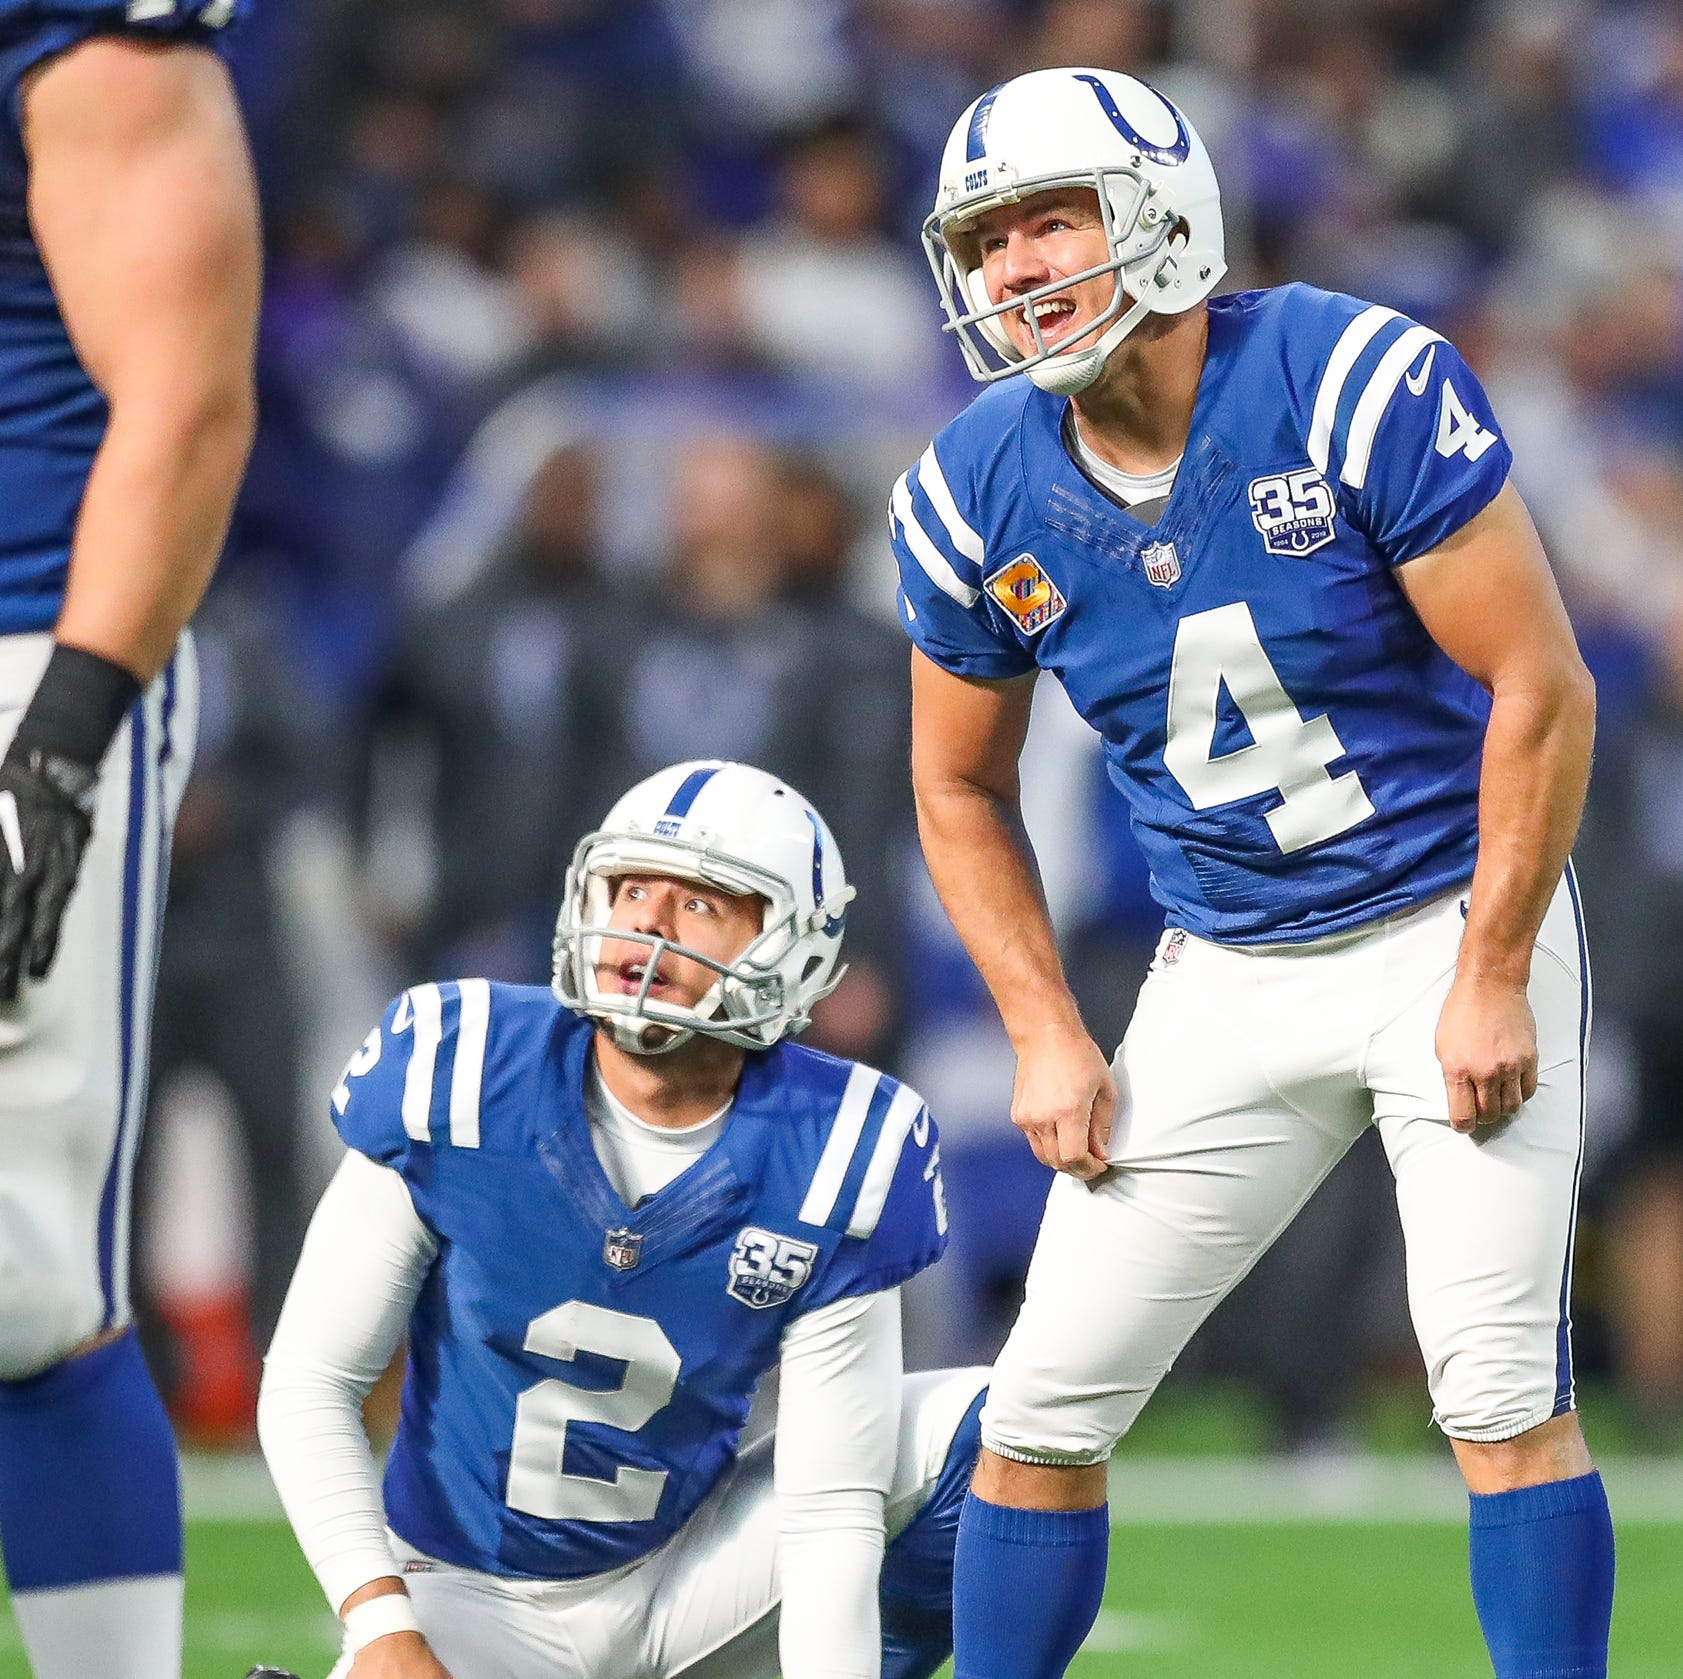 Colts' Adam Vinatieri: 'I'll be on the injury report tomorrow'